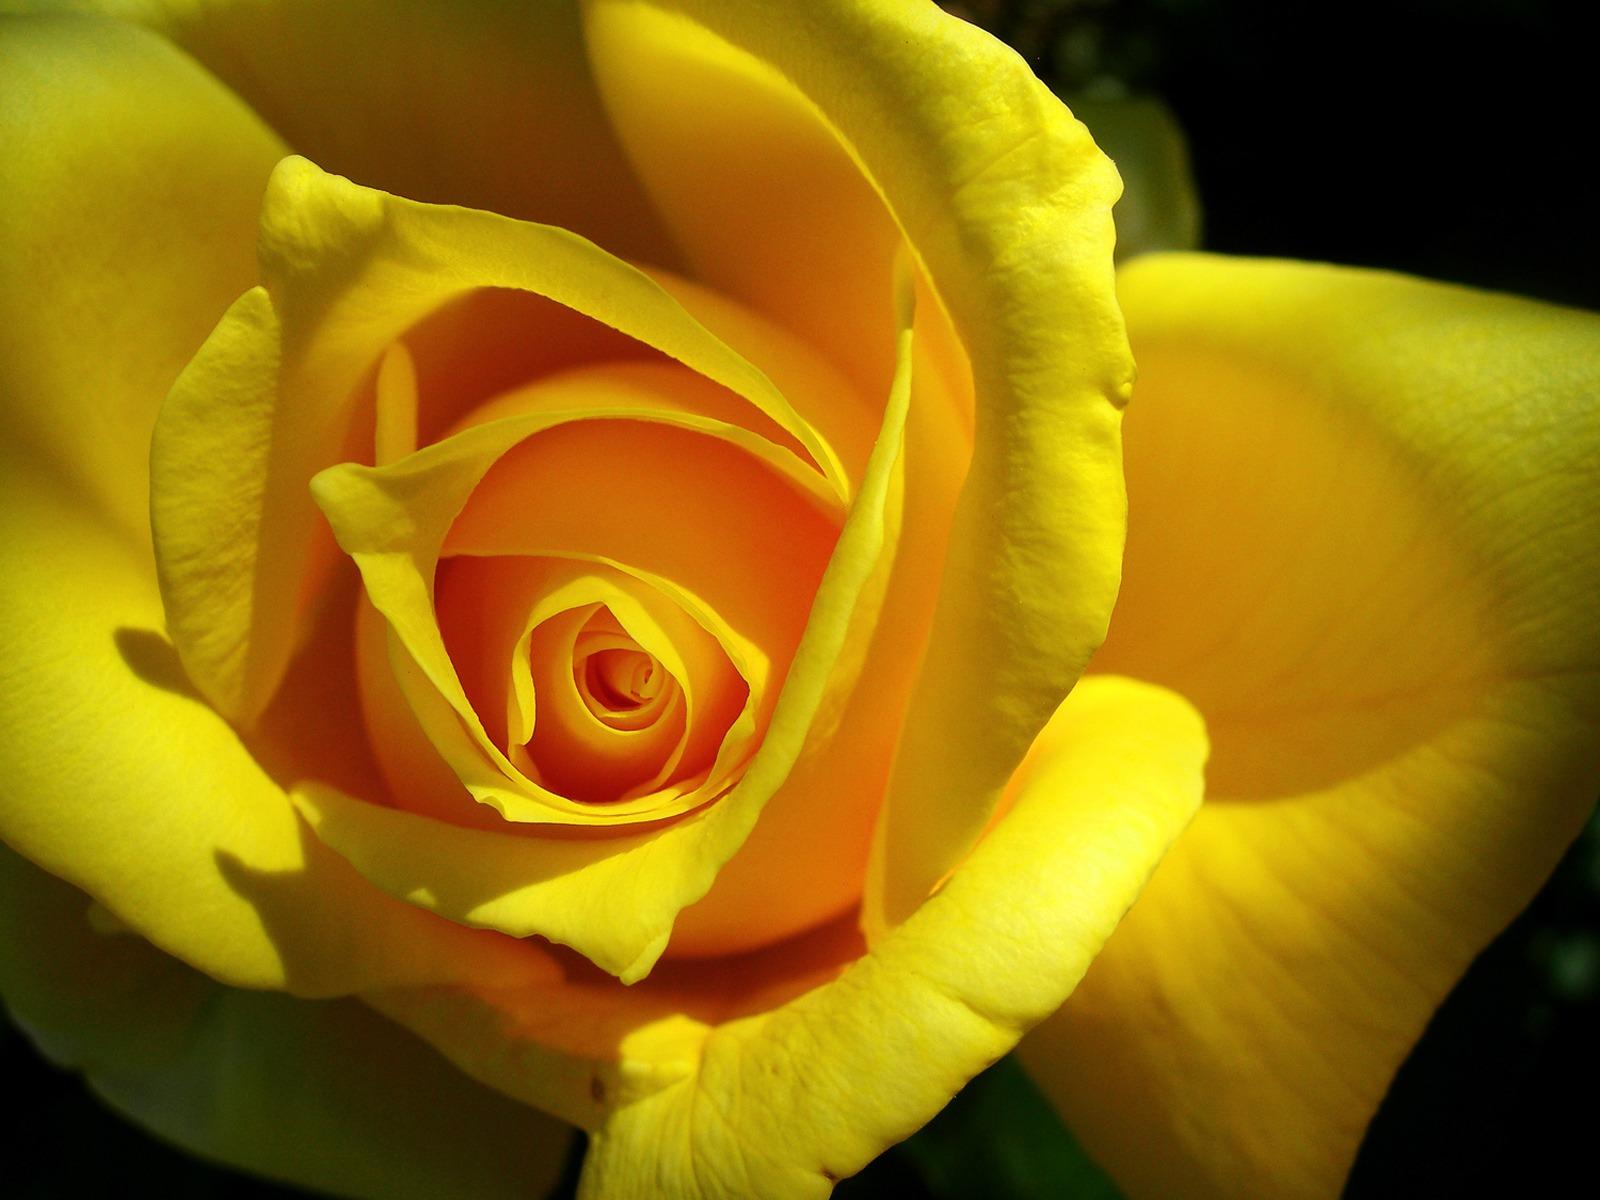 Single yellow flower wallpaper hd of beautiful flower 1600x1200 izmirmasajfo